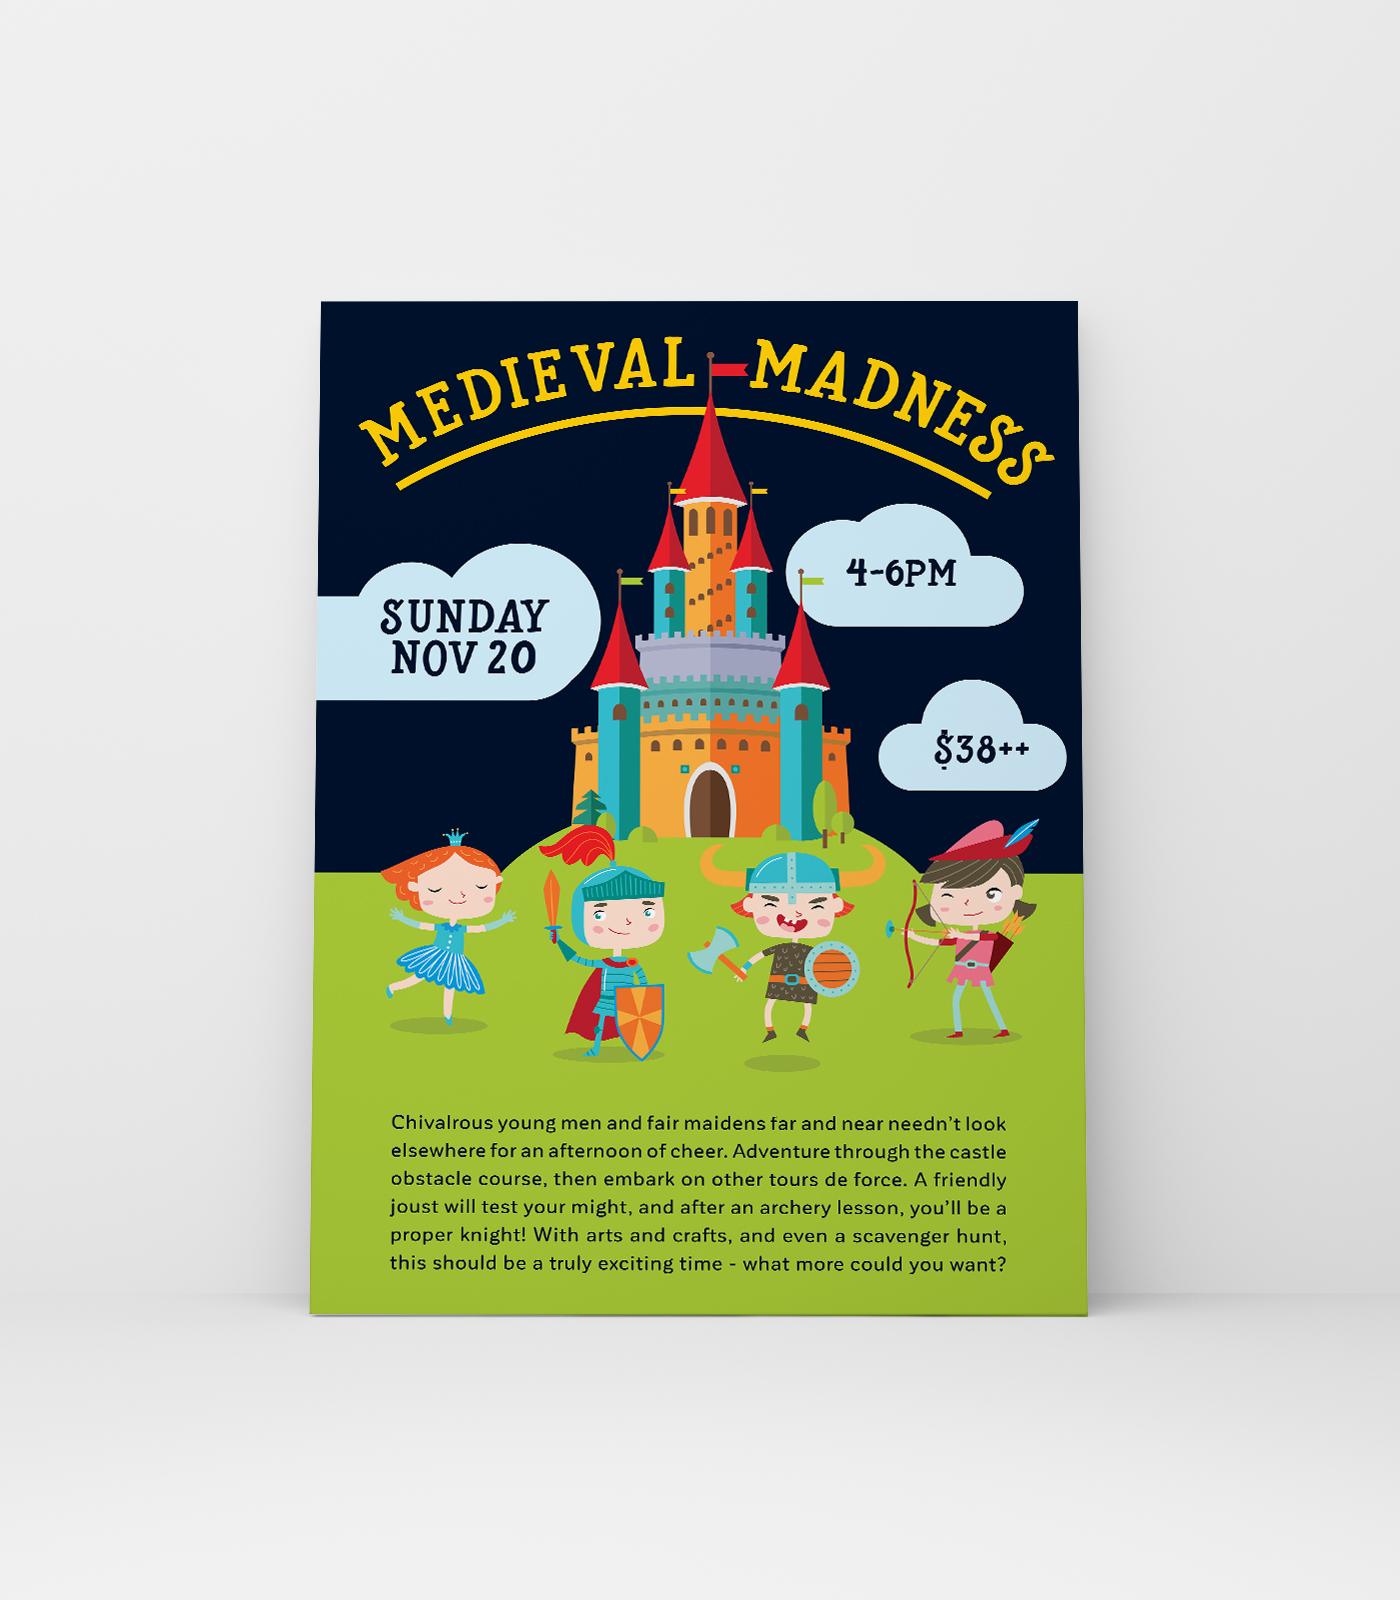 behance-template_medieval-madness.jpg